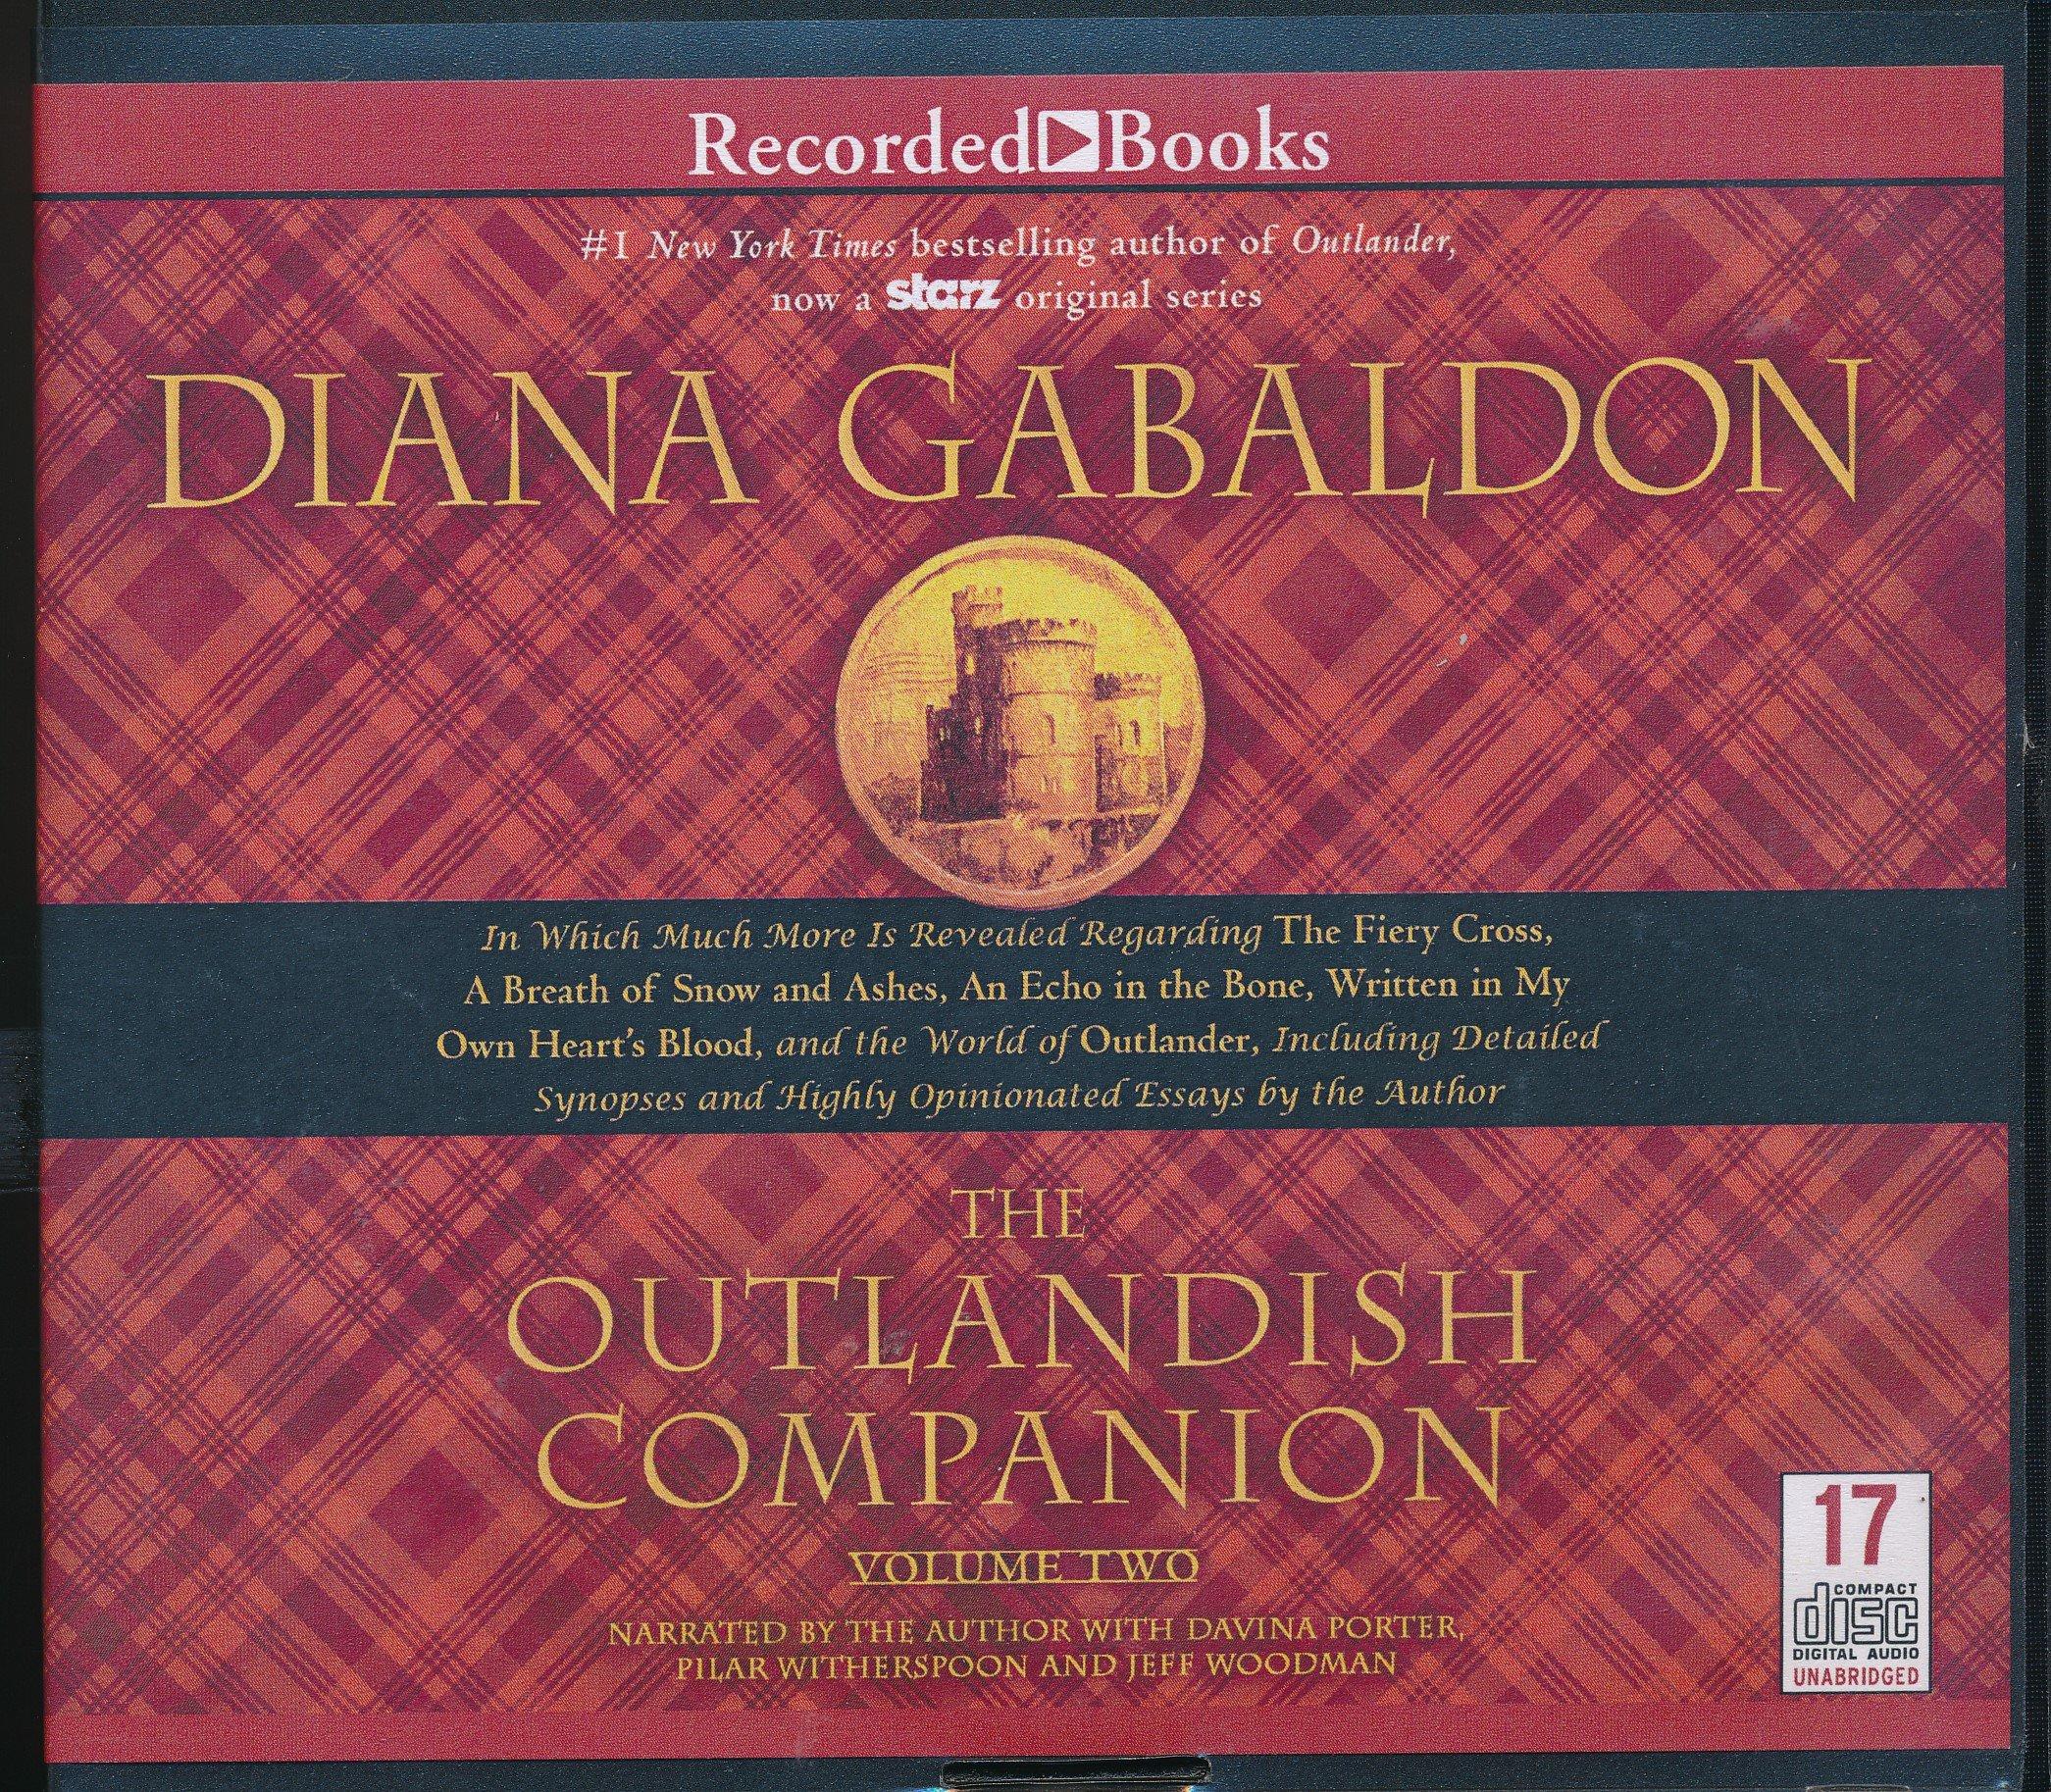 The Outlandish Companion Volume Two: Diana Gabaldon, Pilar Witherspoon,  Jeff Woodman: 9781490691213: Amazon.com: Books